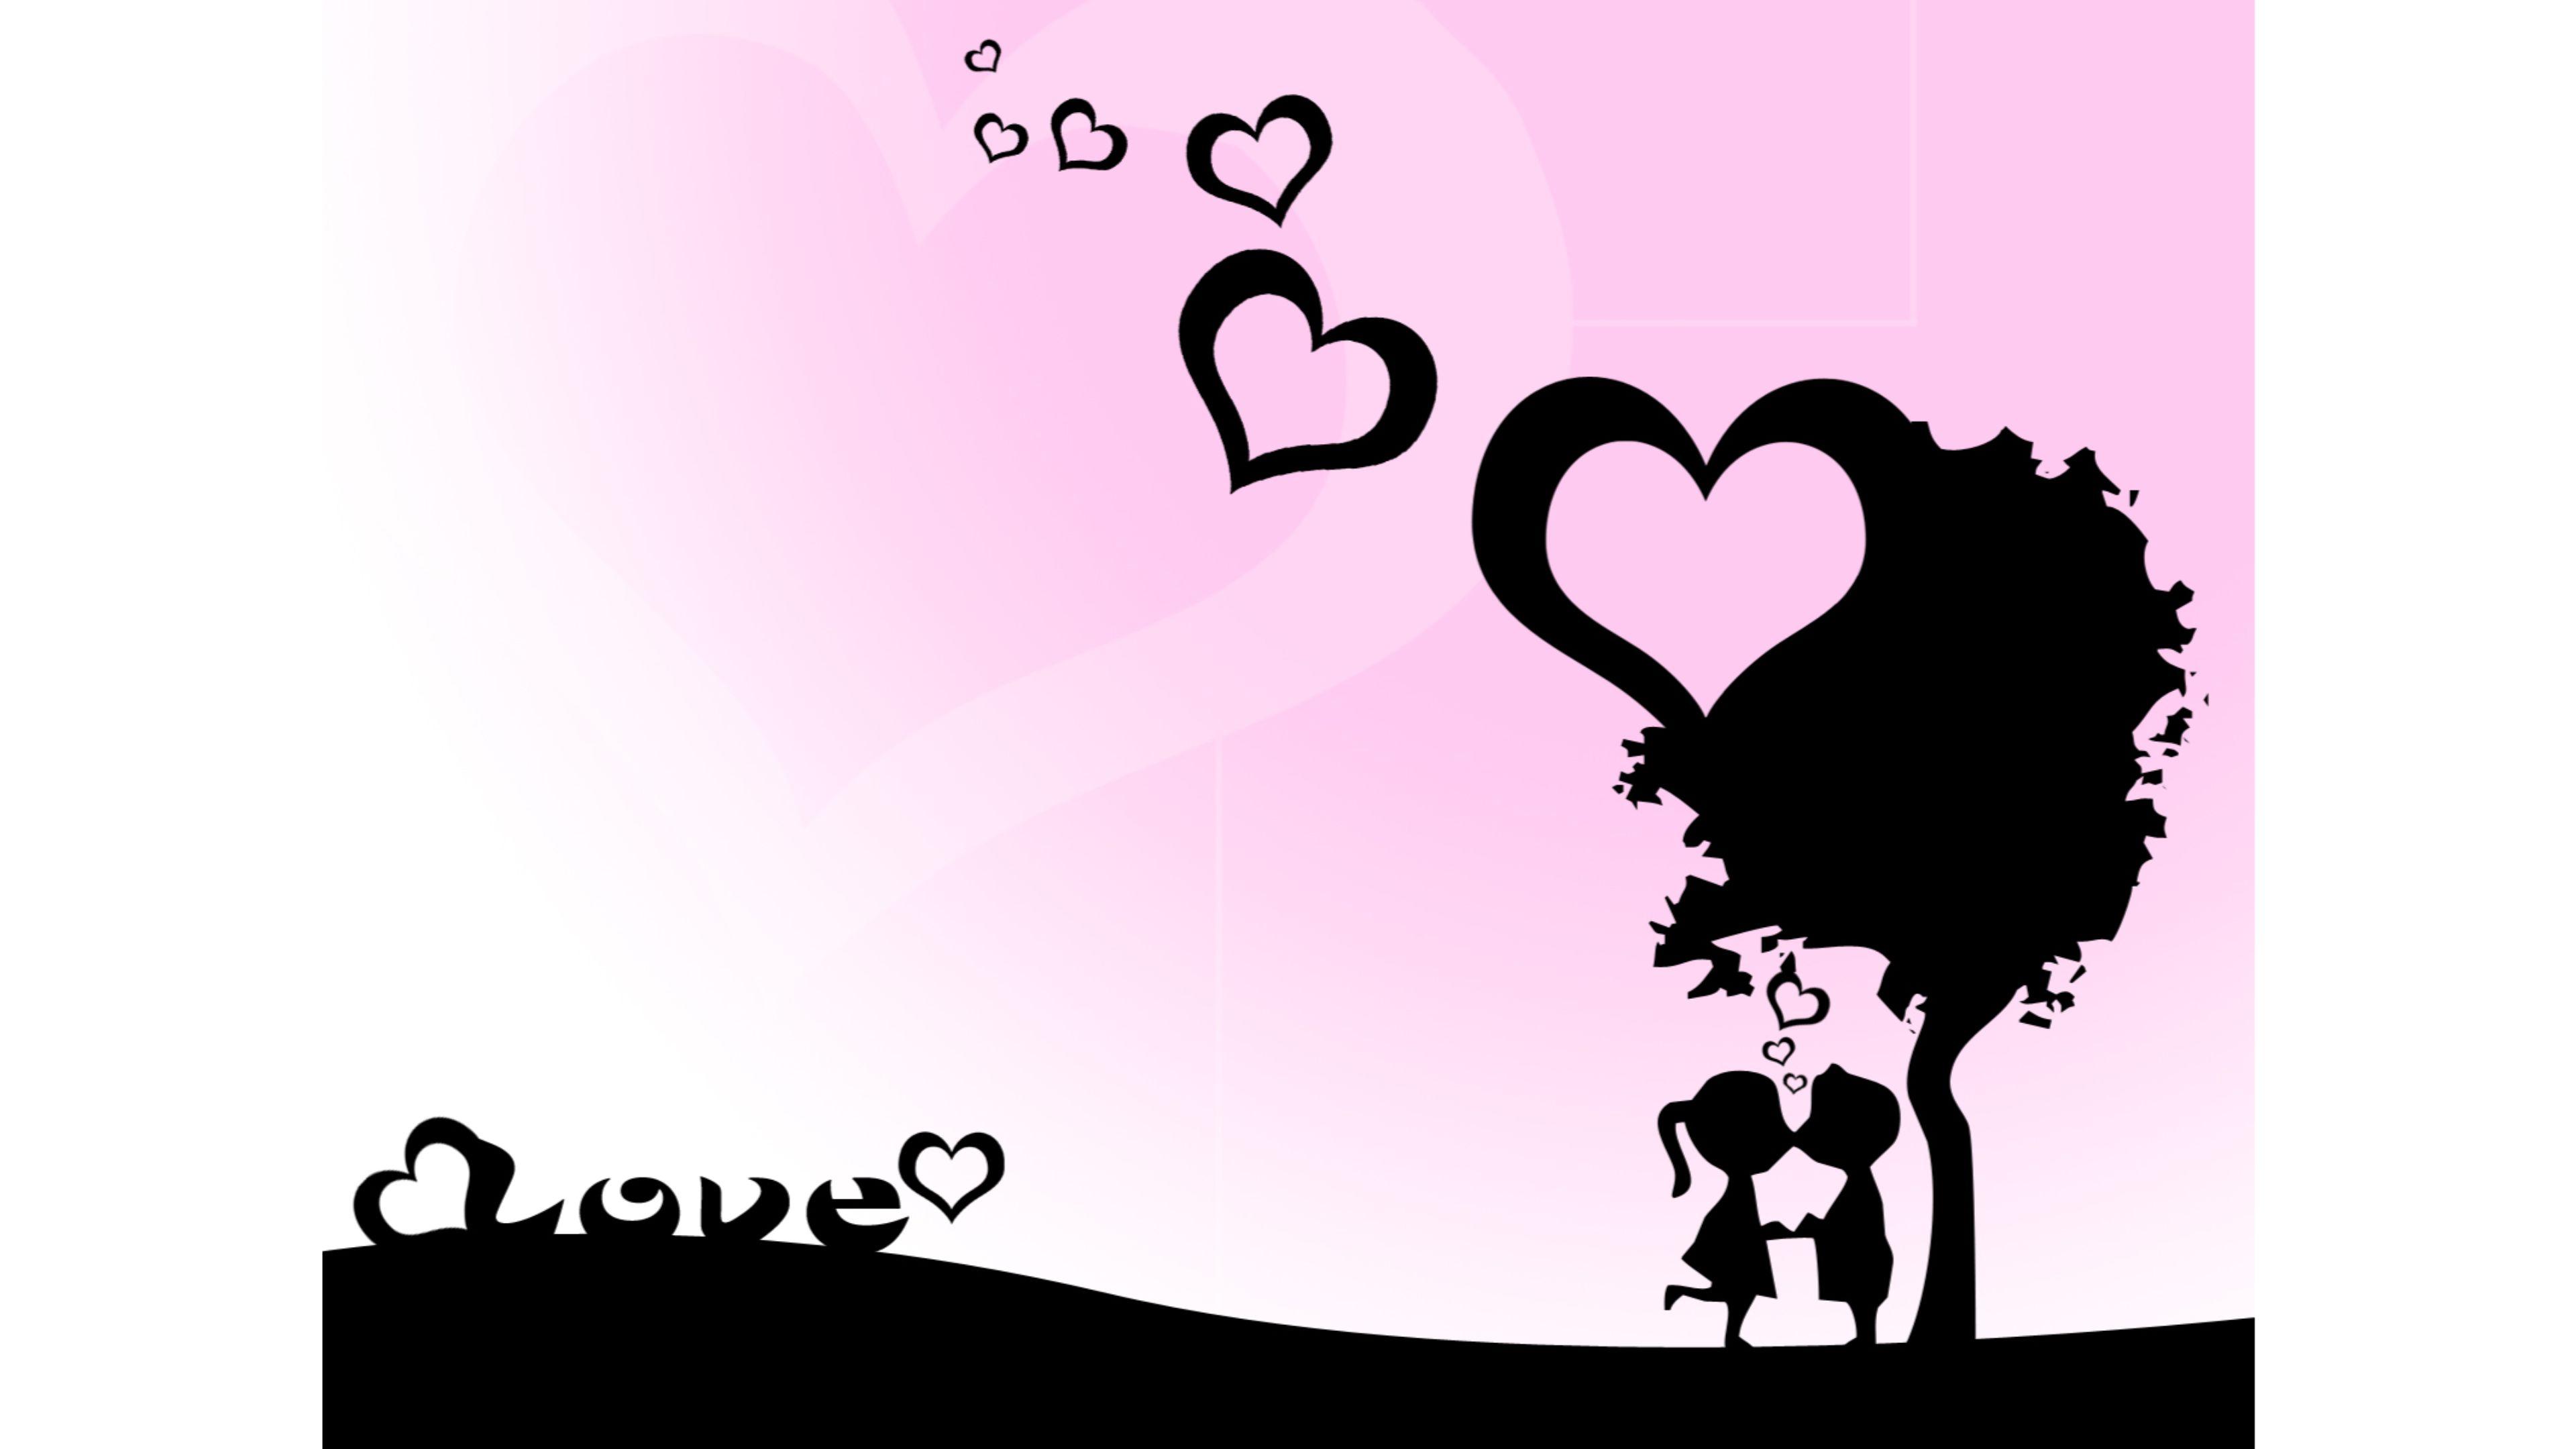 The Best Kiss 4k Love Wallpaper Best Love Wallpapers 4k 583133